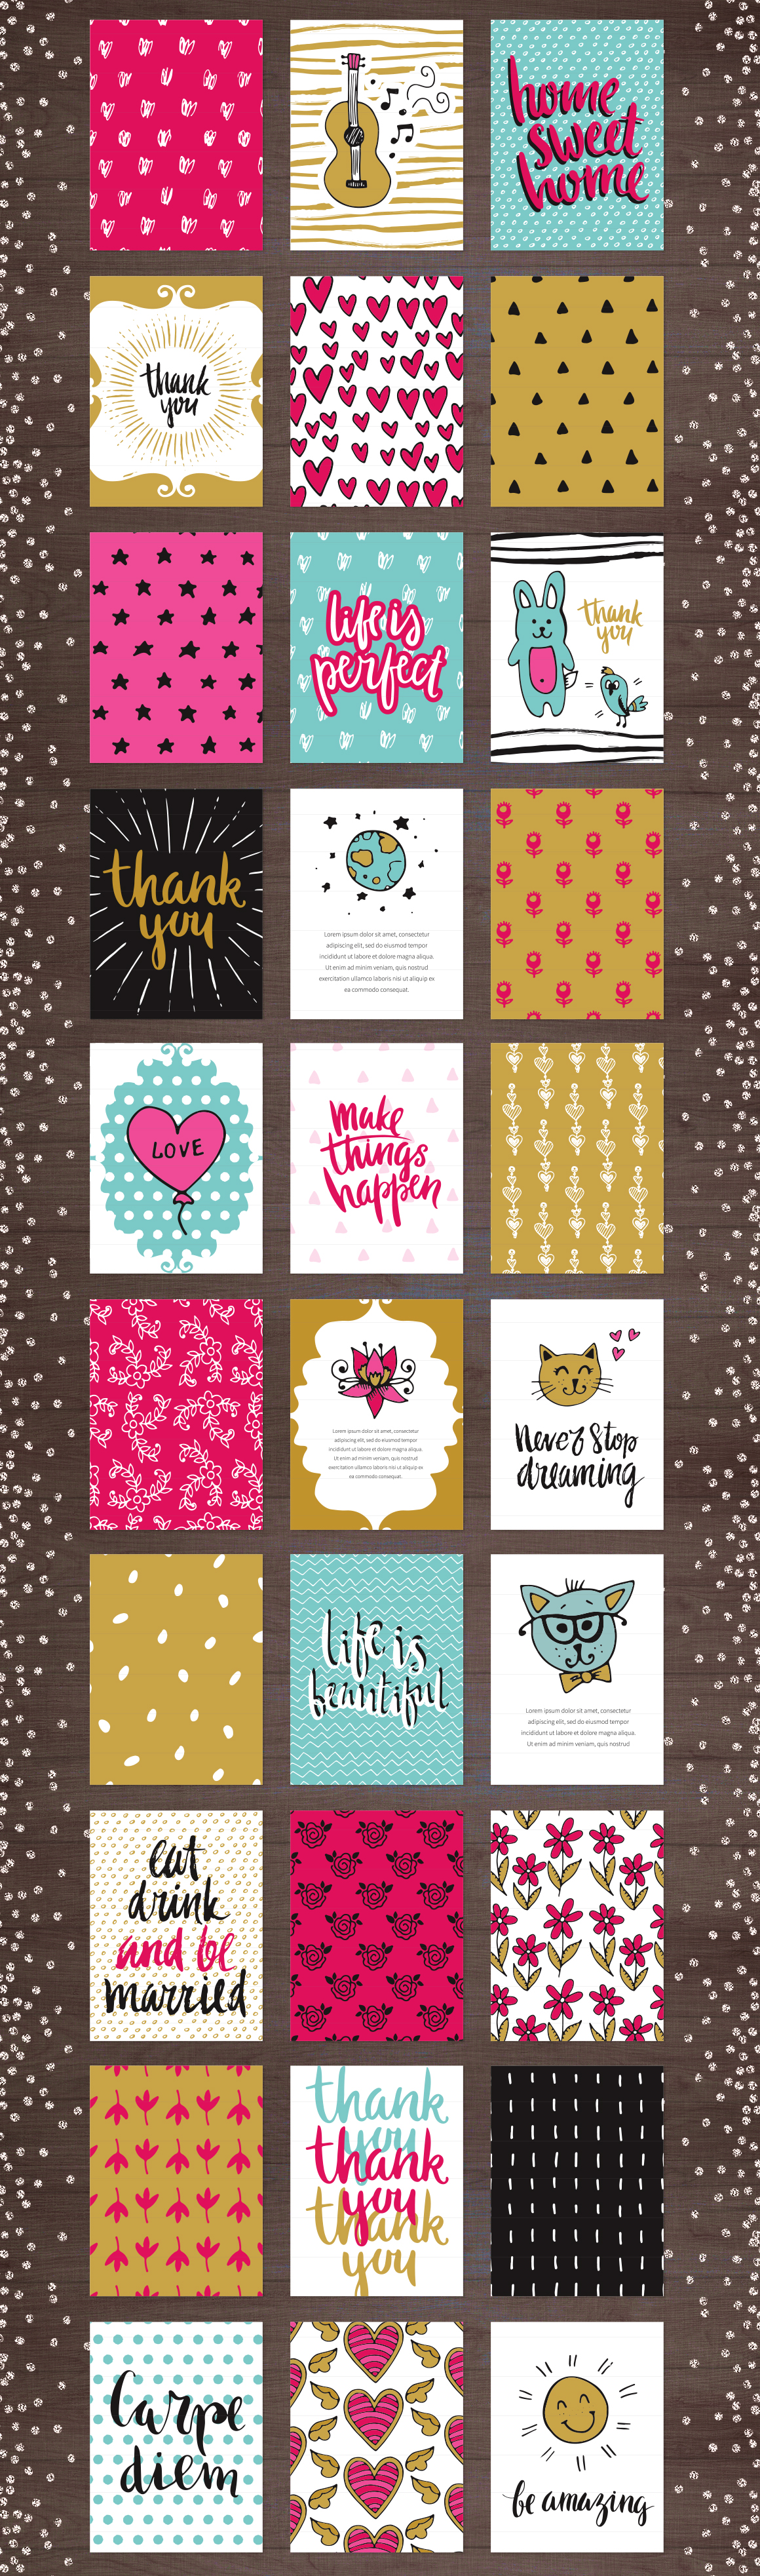 60 Valentine's Day Romantic Cards #3 example image 2